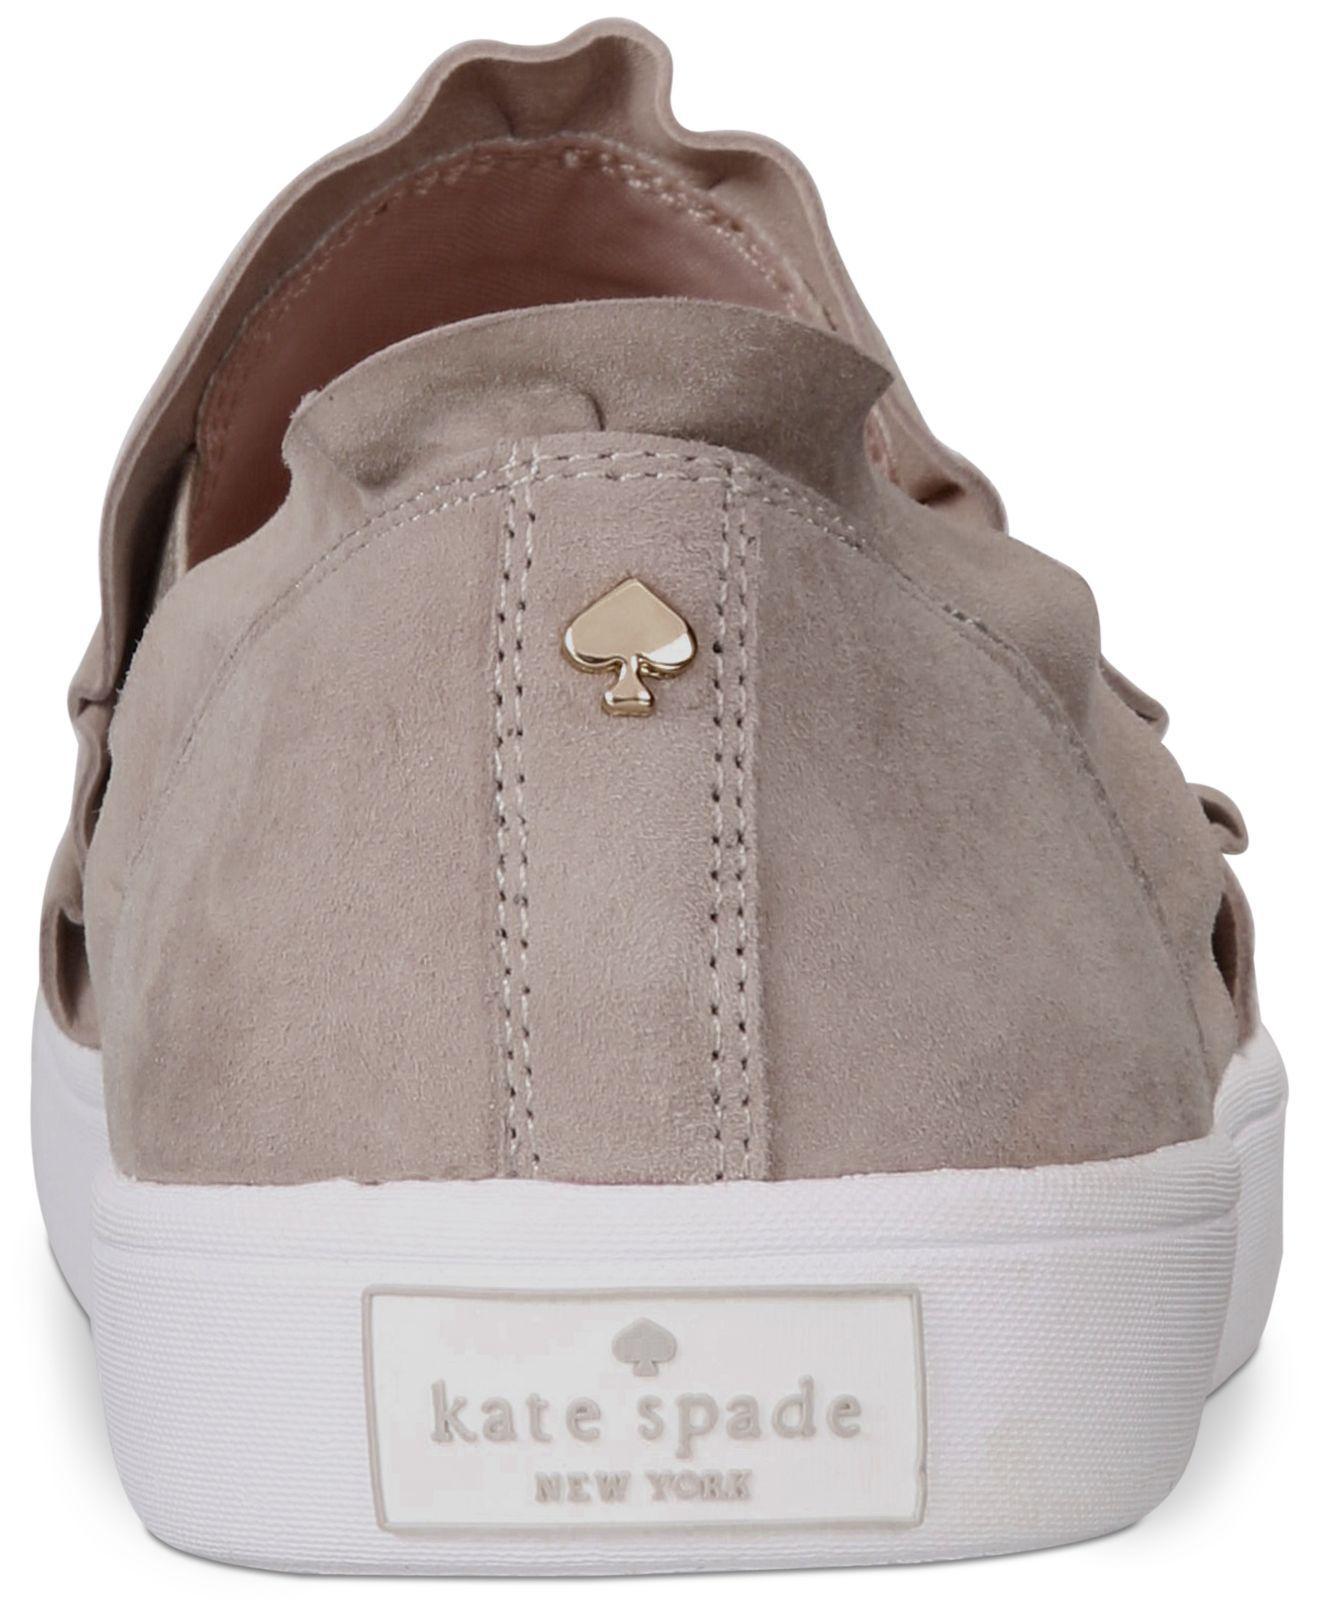 c146b9b2eb95 Kate Spade - Gray Lilly Fashion Sneakers - Lyst. View fullscreen